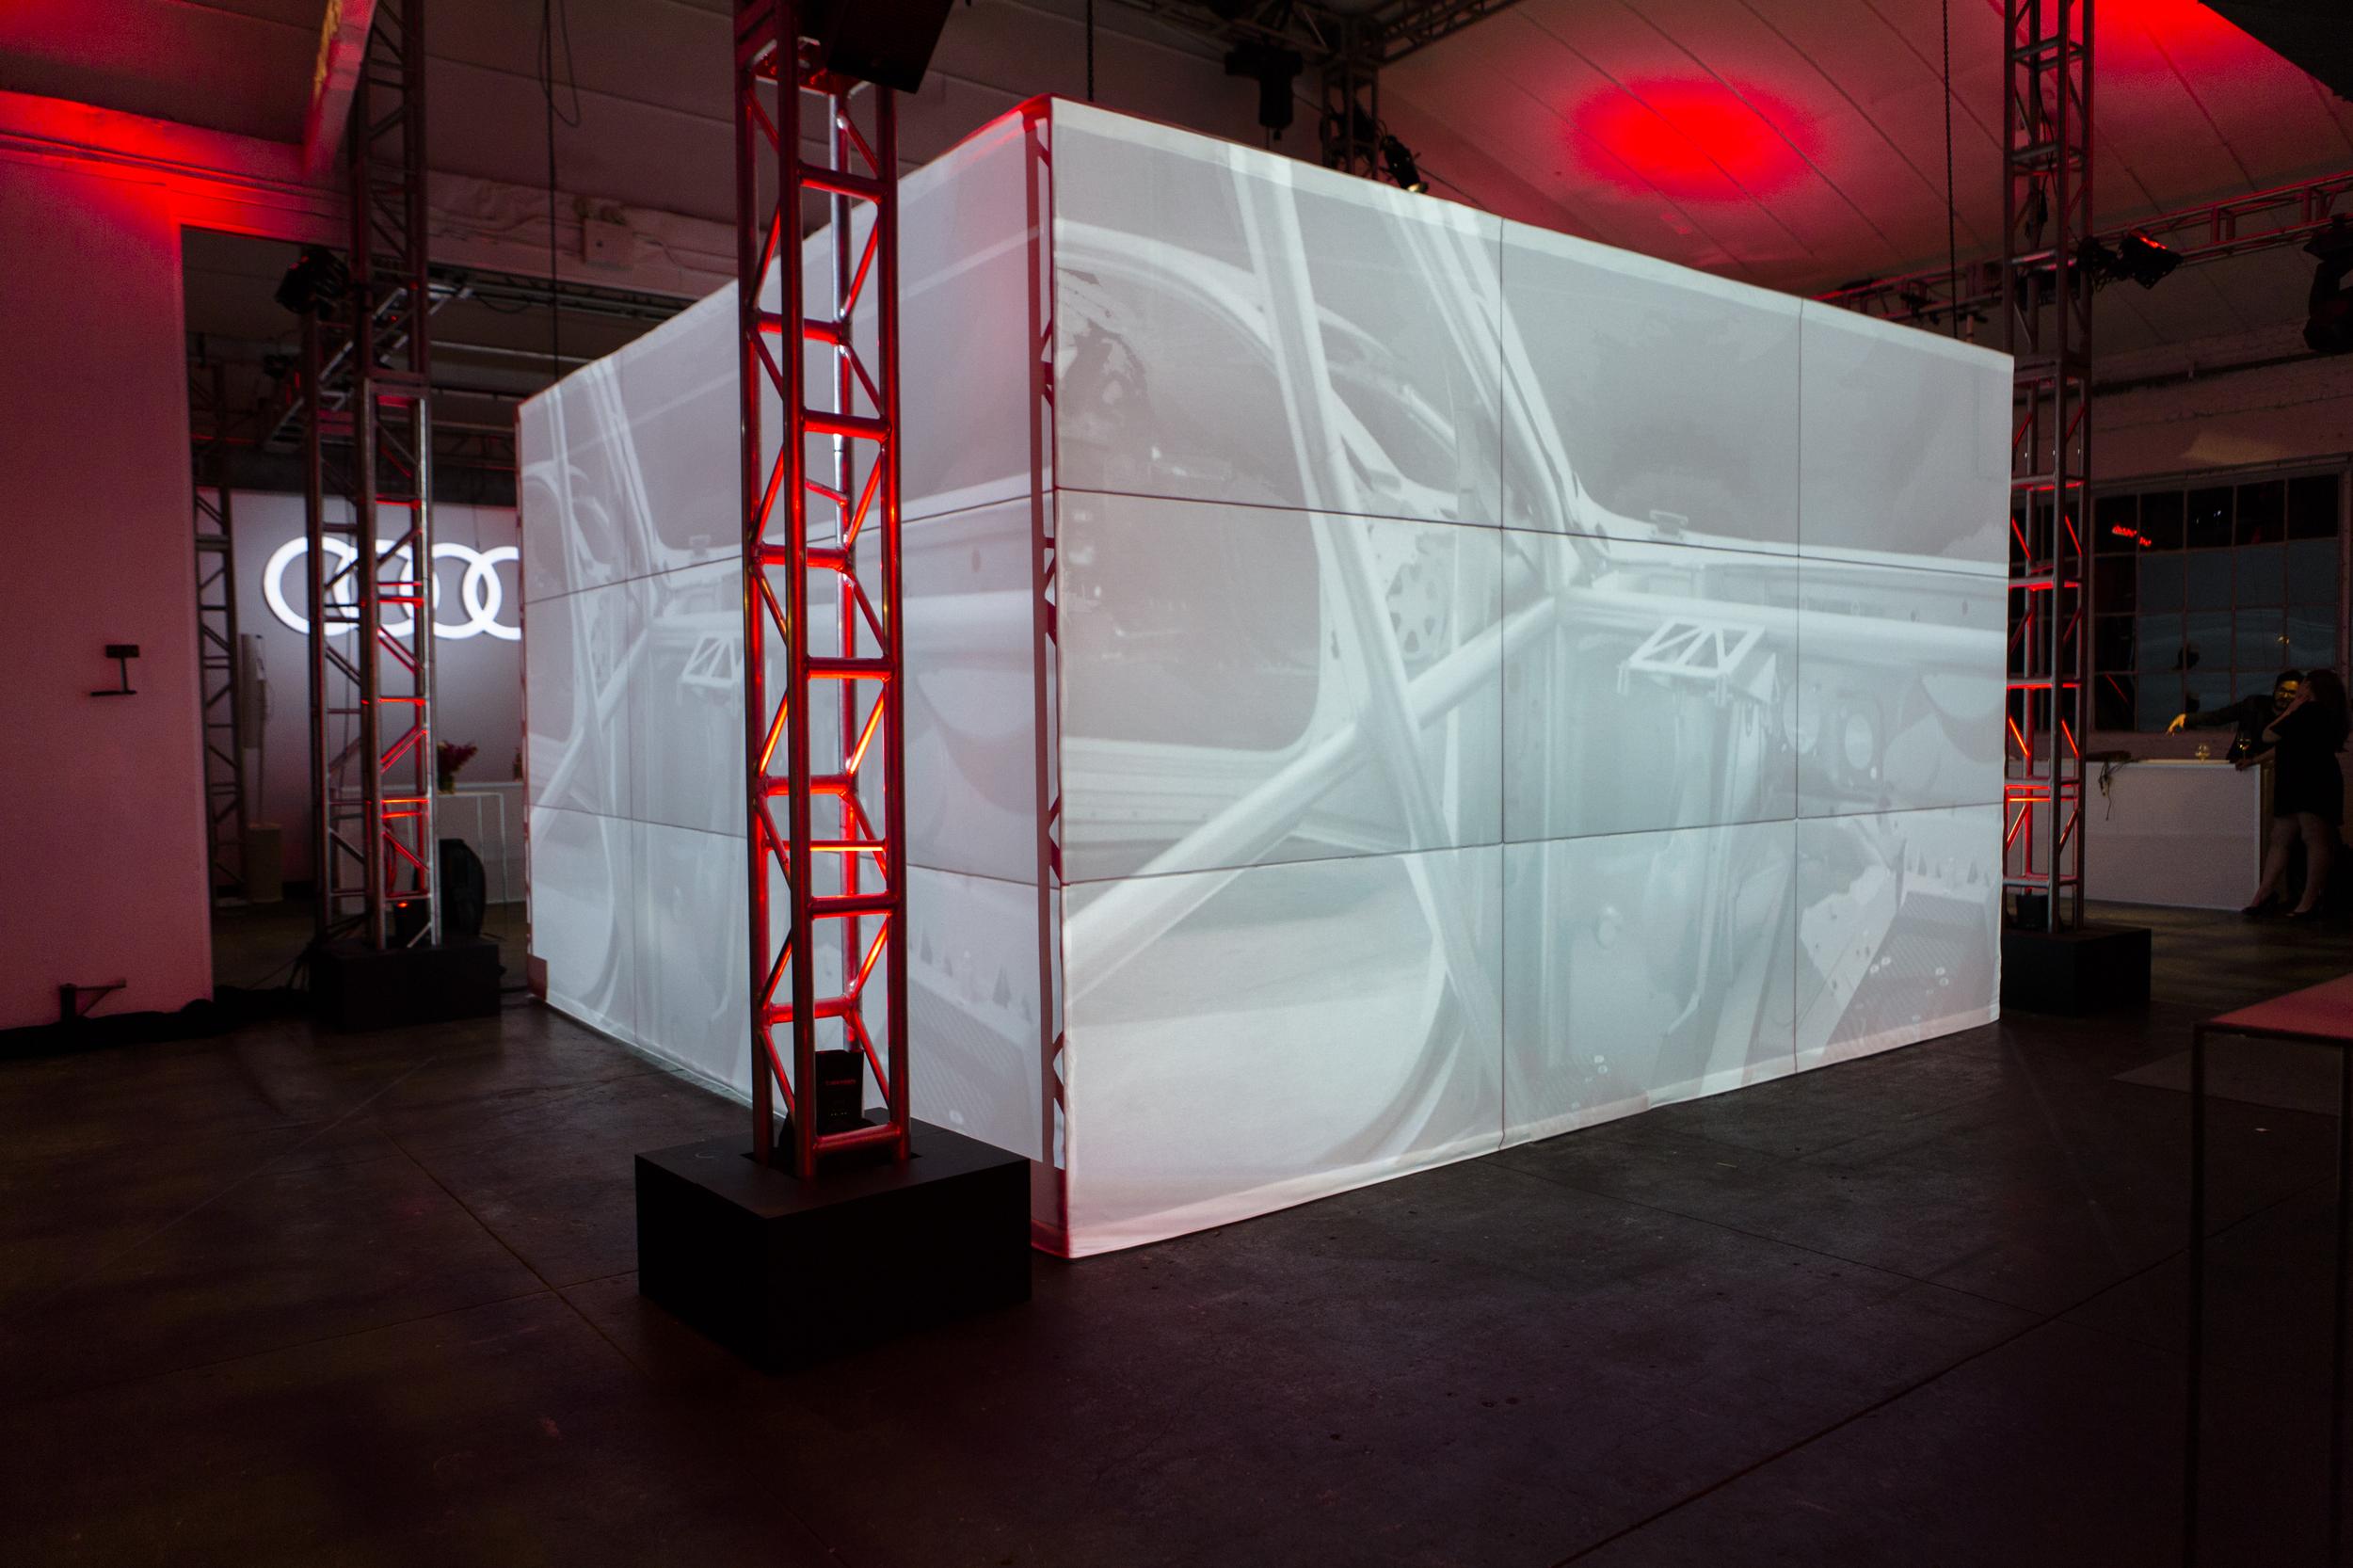 Audi-HD-205_B6A9822.jpg